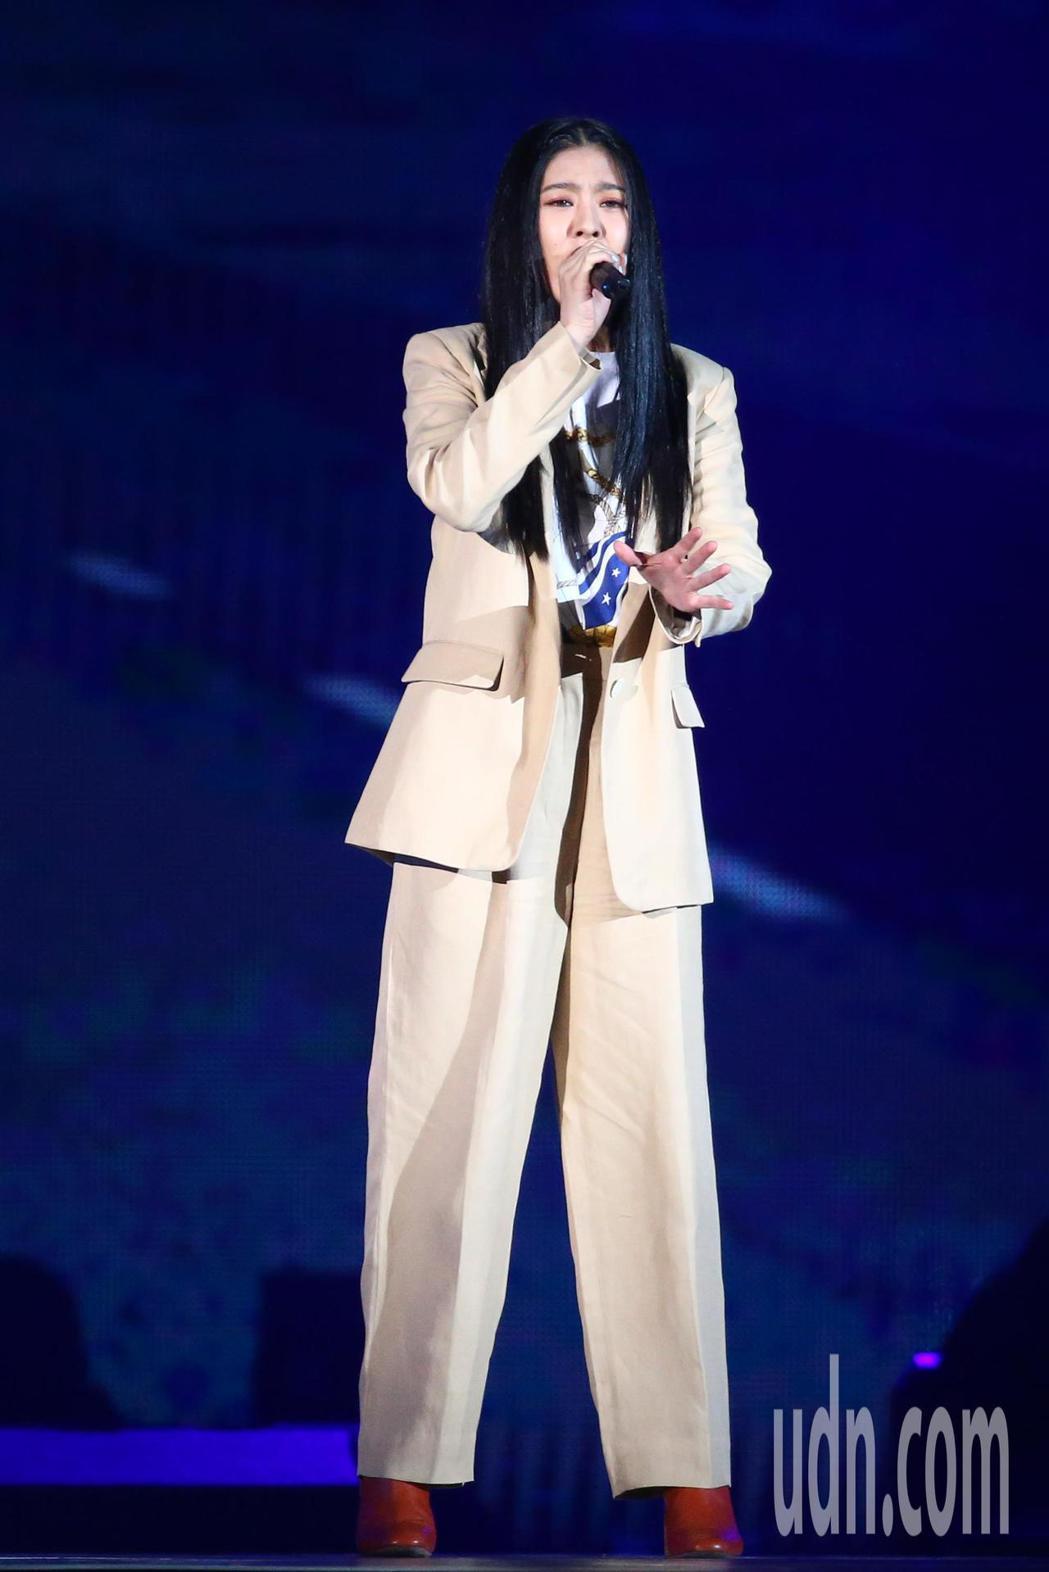 2019 hito流行音樂獎頒獎典禮今天在小巨蛋舉行,劉艾立擔任表演嘉賓演唱《擁